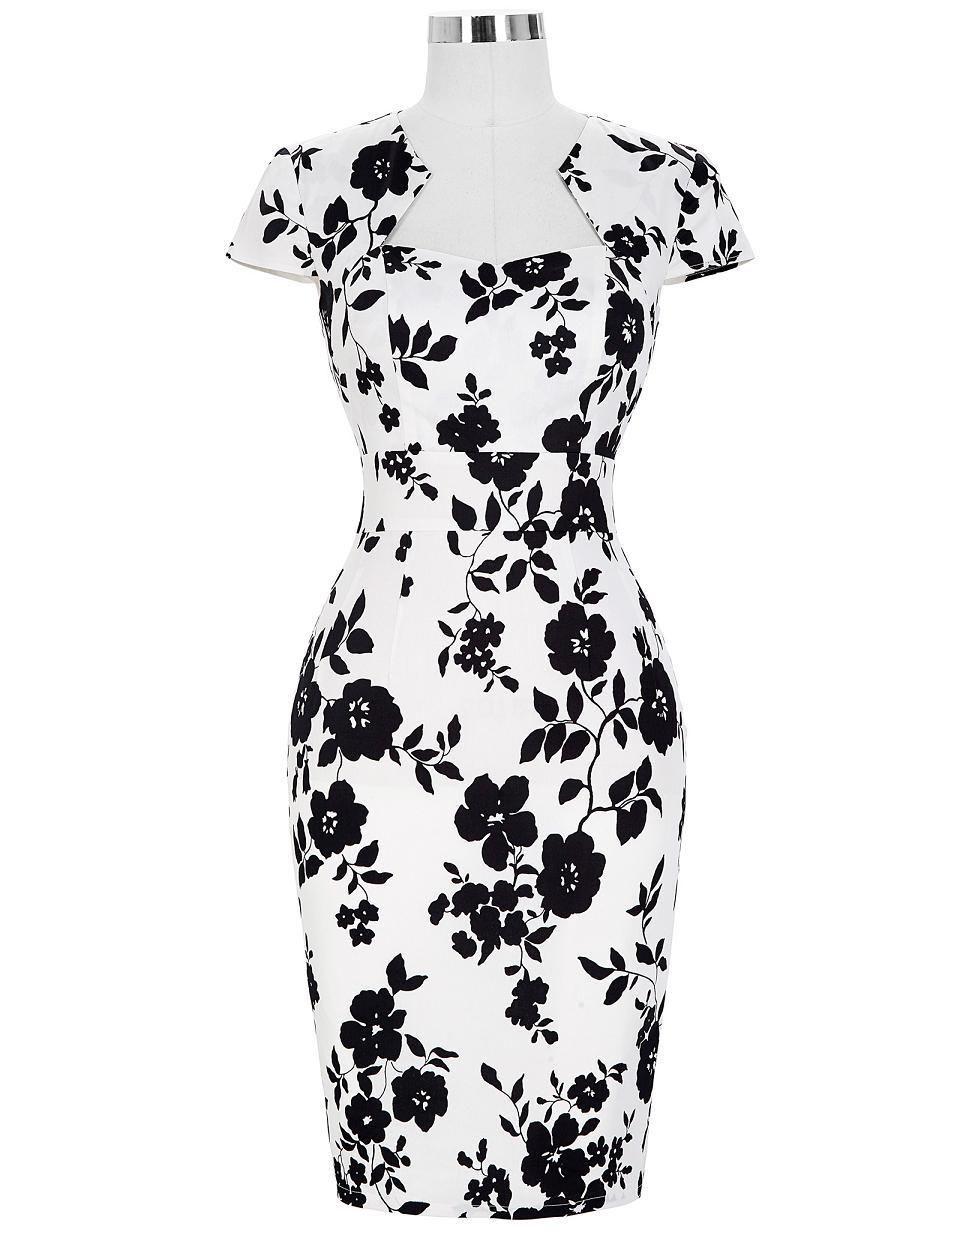 8cc45607c54 Plus Size Pencil Rockabilly Office Vintage Bodycon Dress